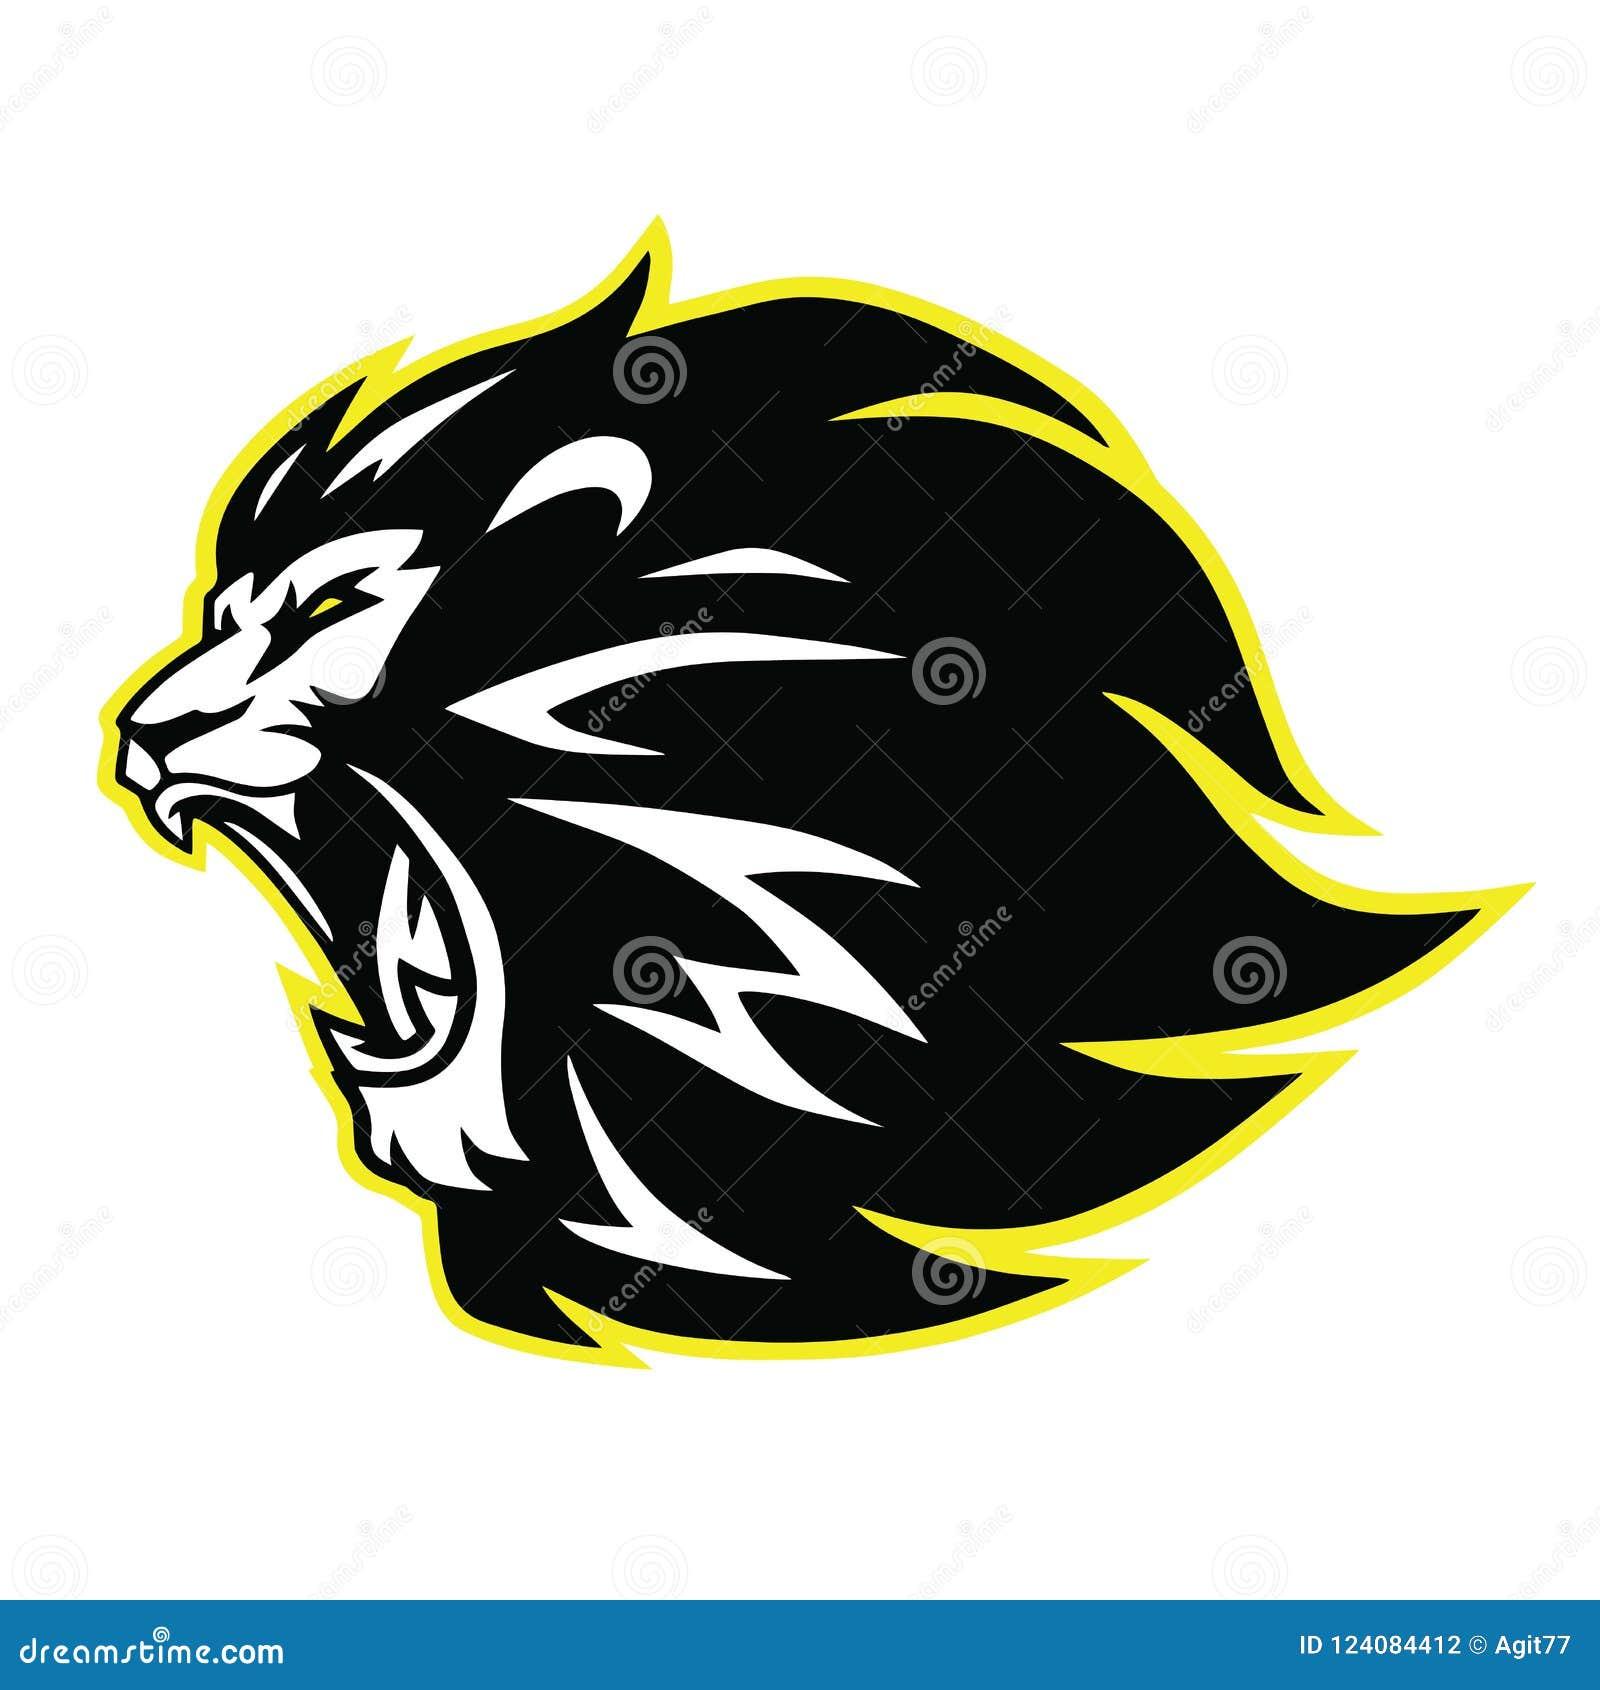 Lion Roaring Head Logo, Sign, Vector Black And White Design Icon